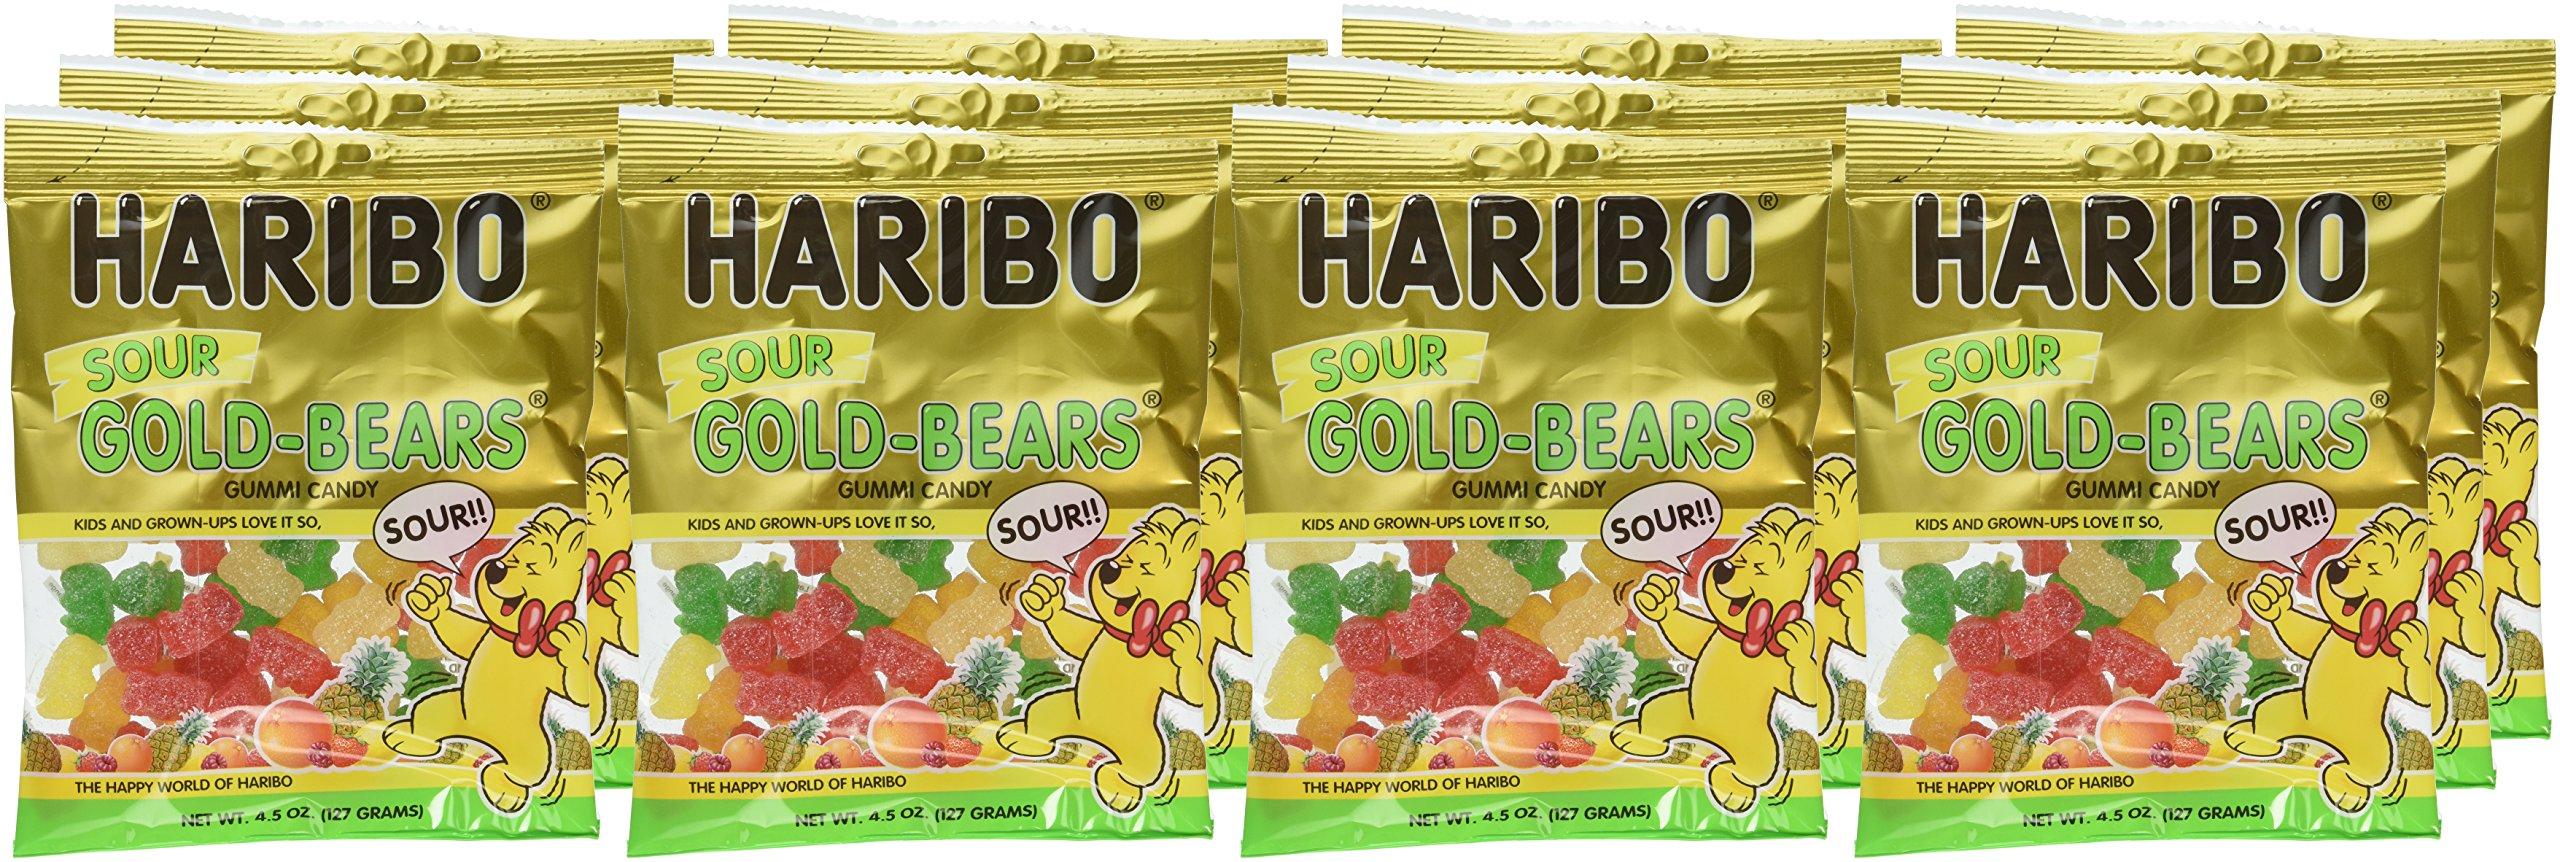 Haribo Gummi Candy, Goldbears Gummi Candy, Sour, 4.5 oz. Bag (Pack of 12) by Haribo (Image #3)